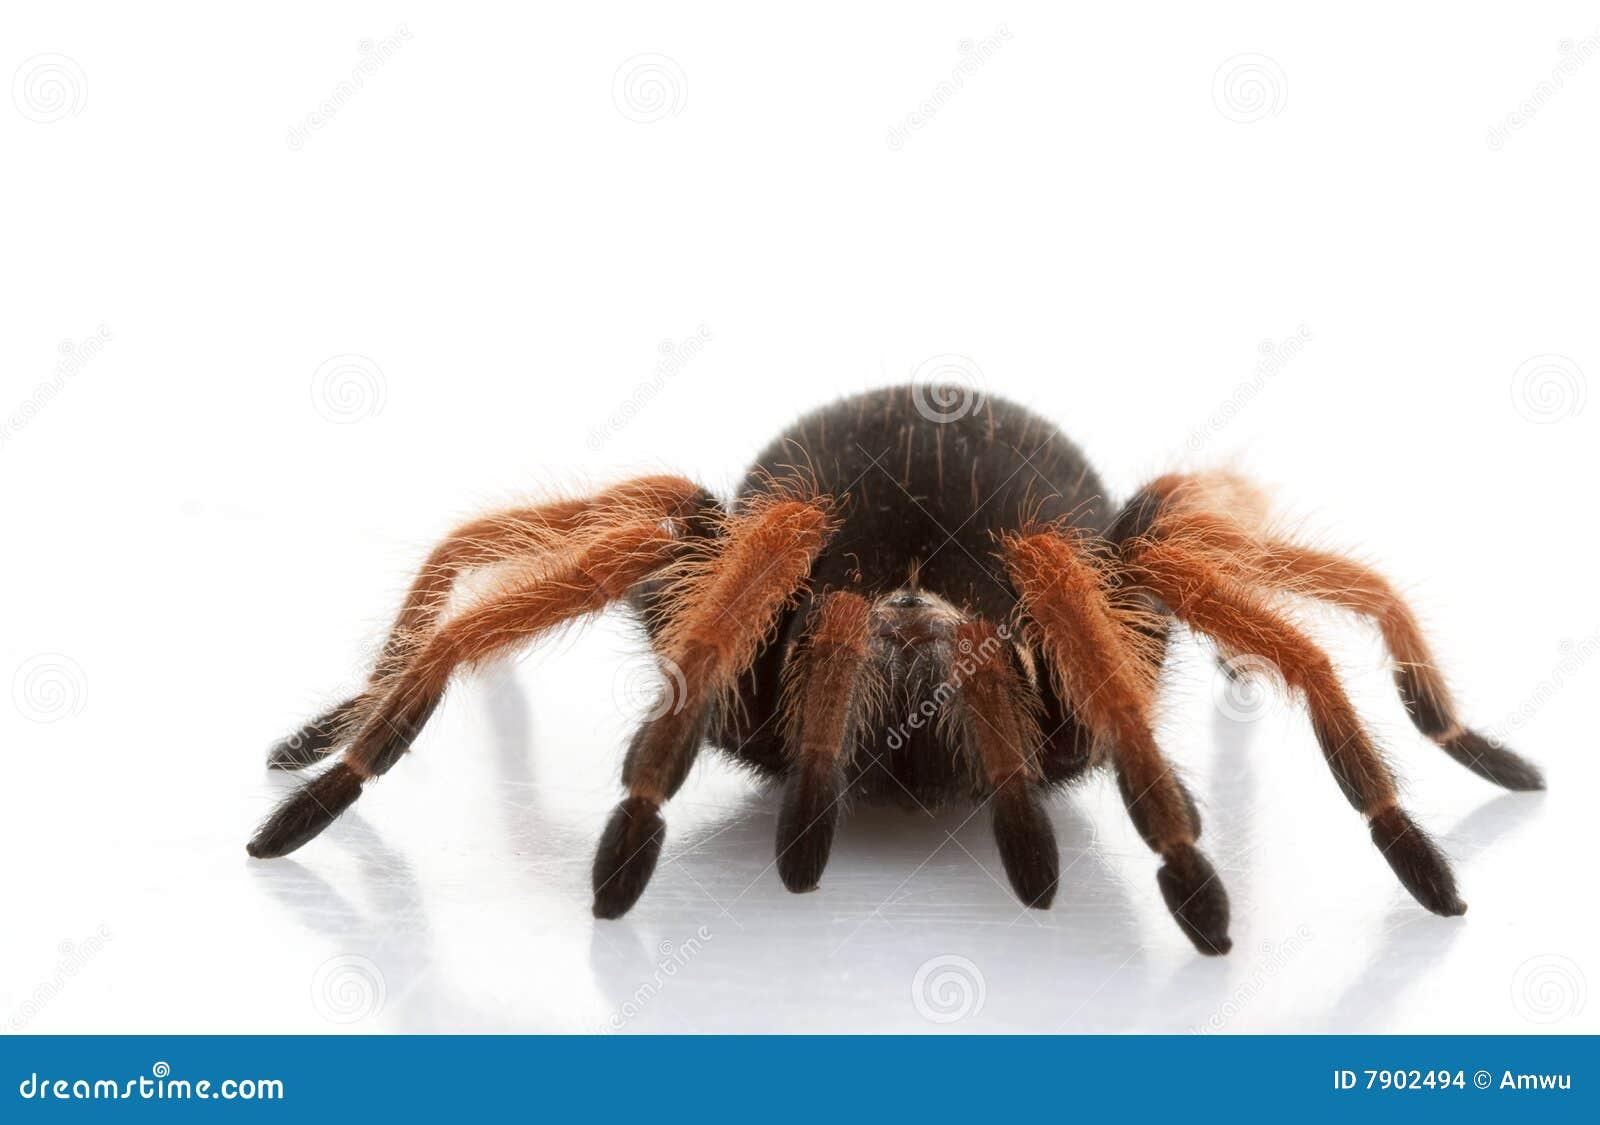 Mexican red leg tarantula